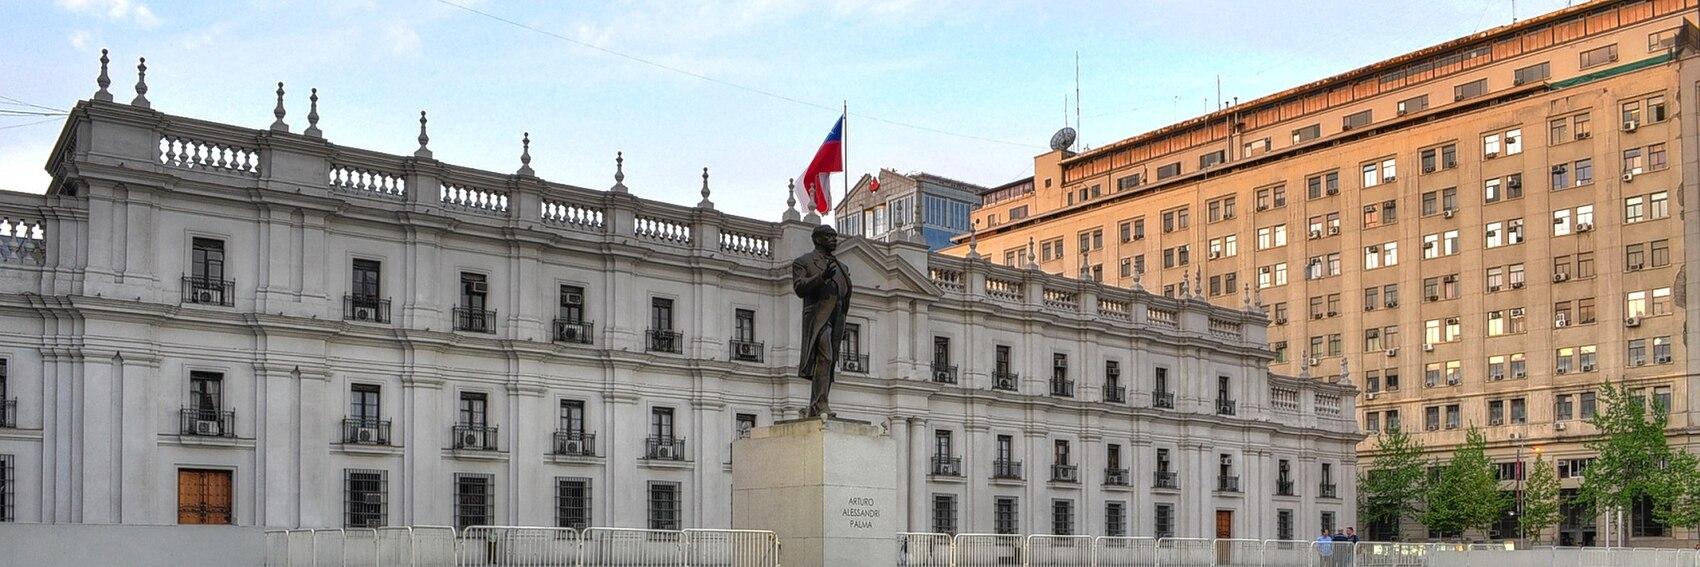 Santiago Travel Guide